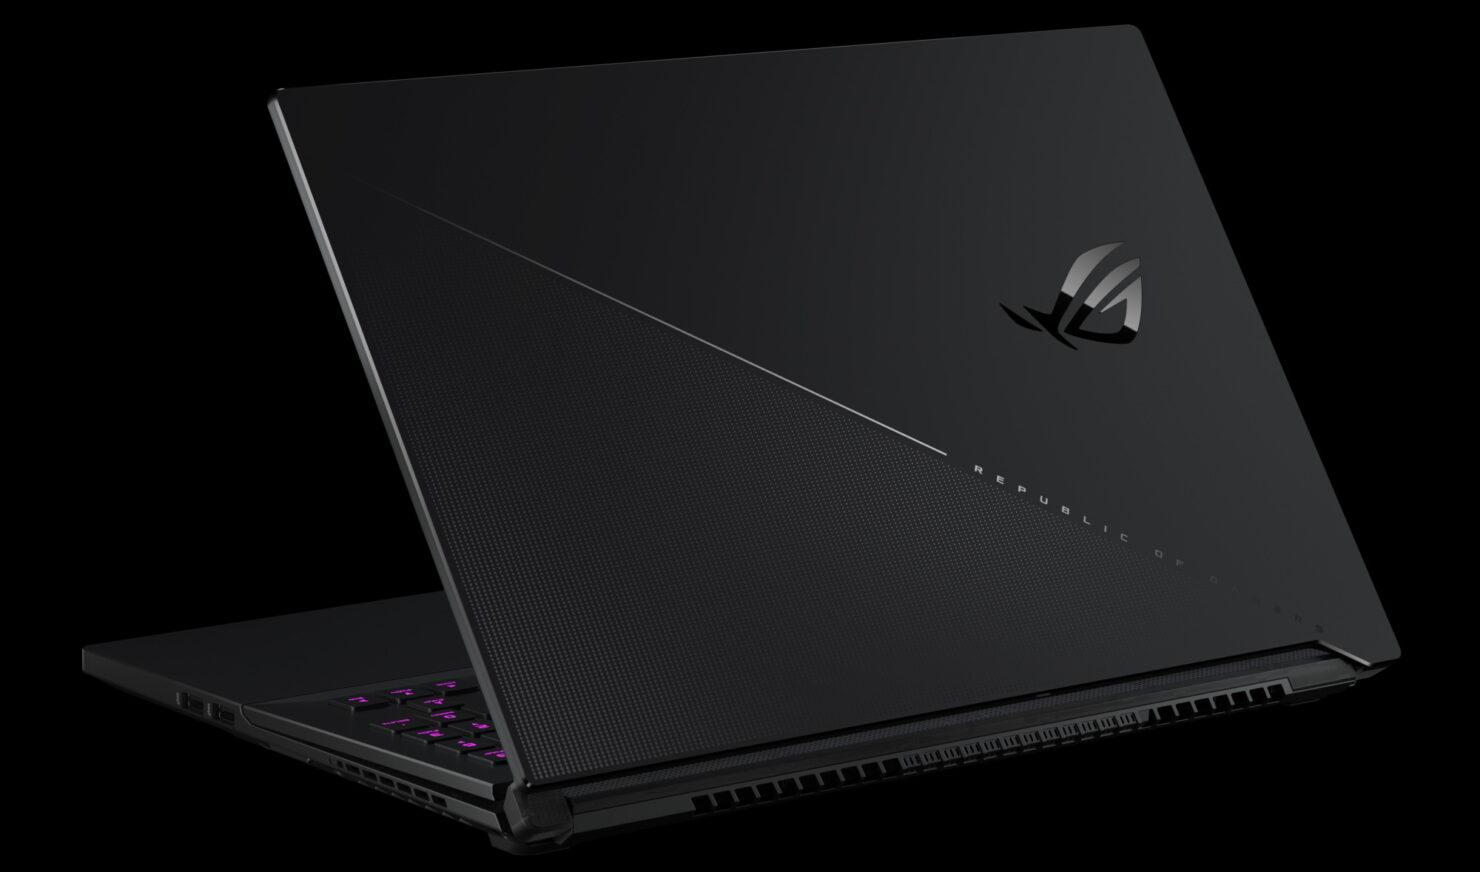 asus-rog-zephyrus-s17-gaming-laptop-_4